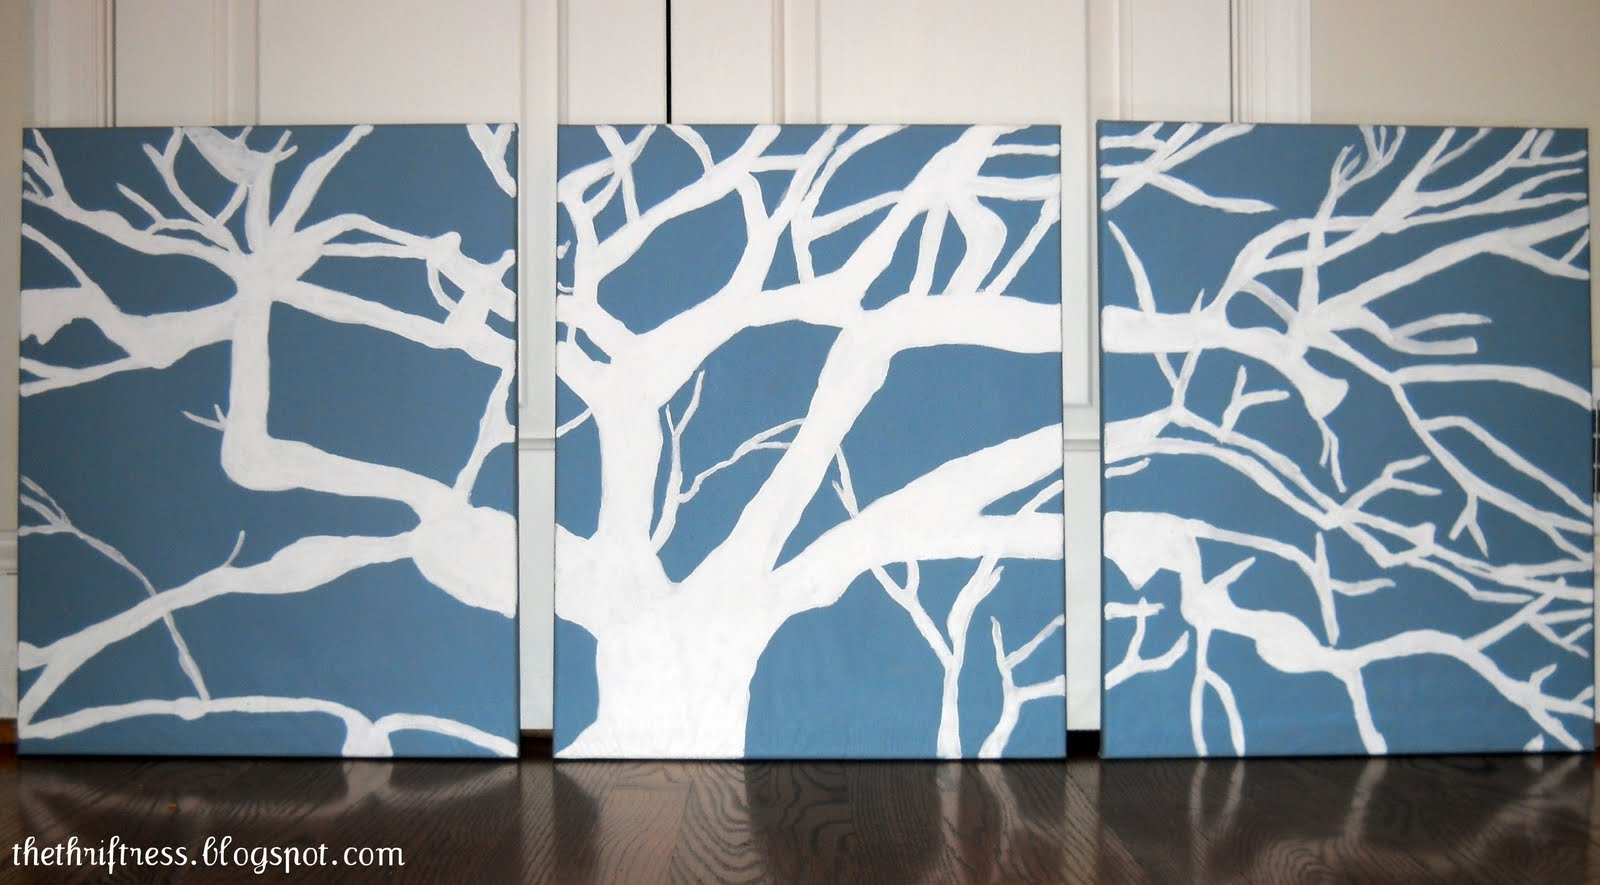 Diy Wall Art Masterpiece – Dma Homes | #81925 Regarding Current Homemade Canvas Wall Art (View 12 of 15)